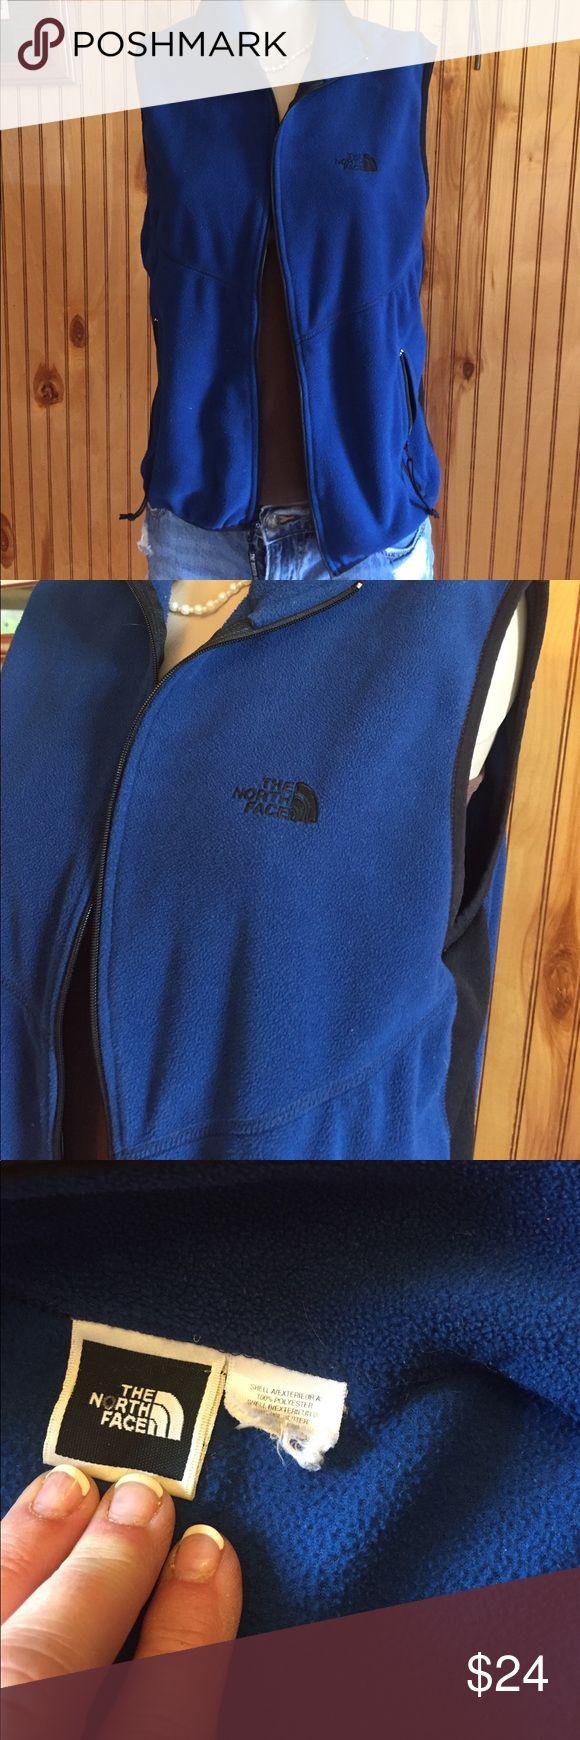 The North Face vest TNF vest. No size tag but I think it's a medium The North Face Jackets & Coats Vests